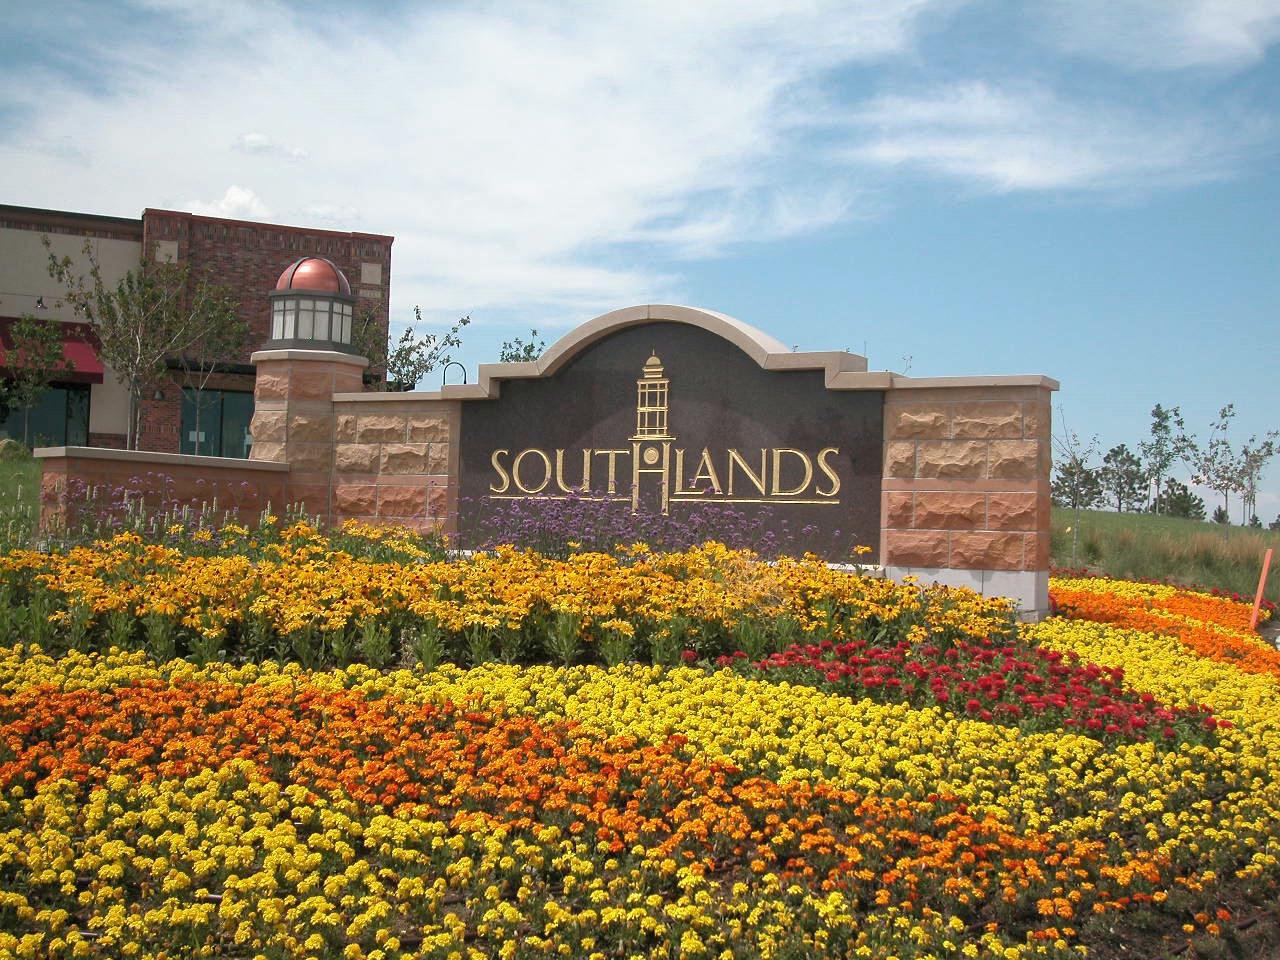 southlands2(1).JPG